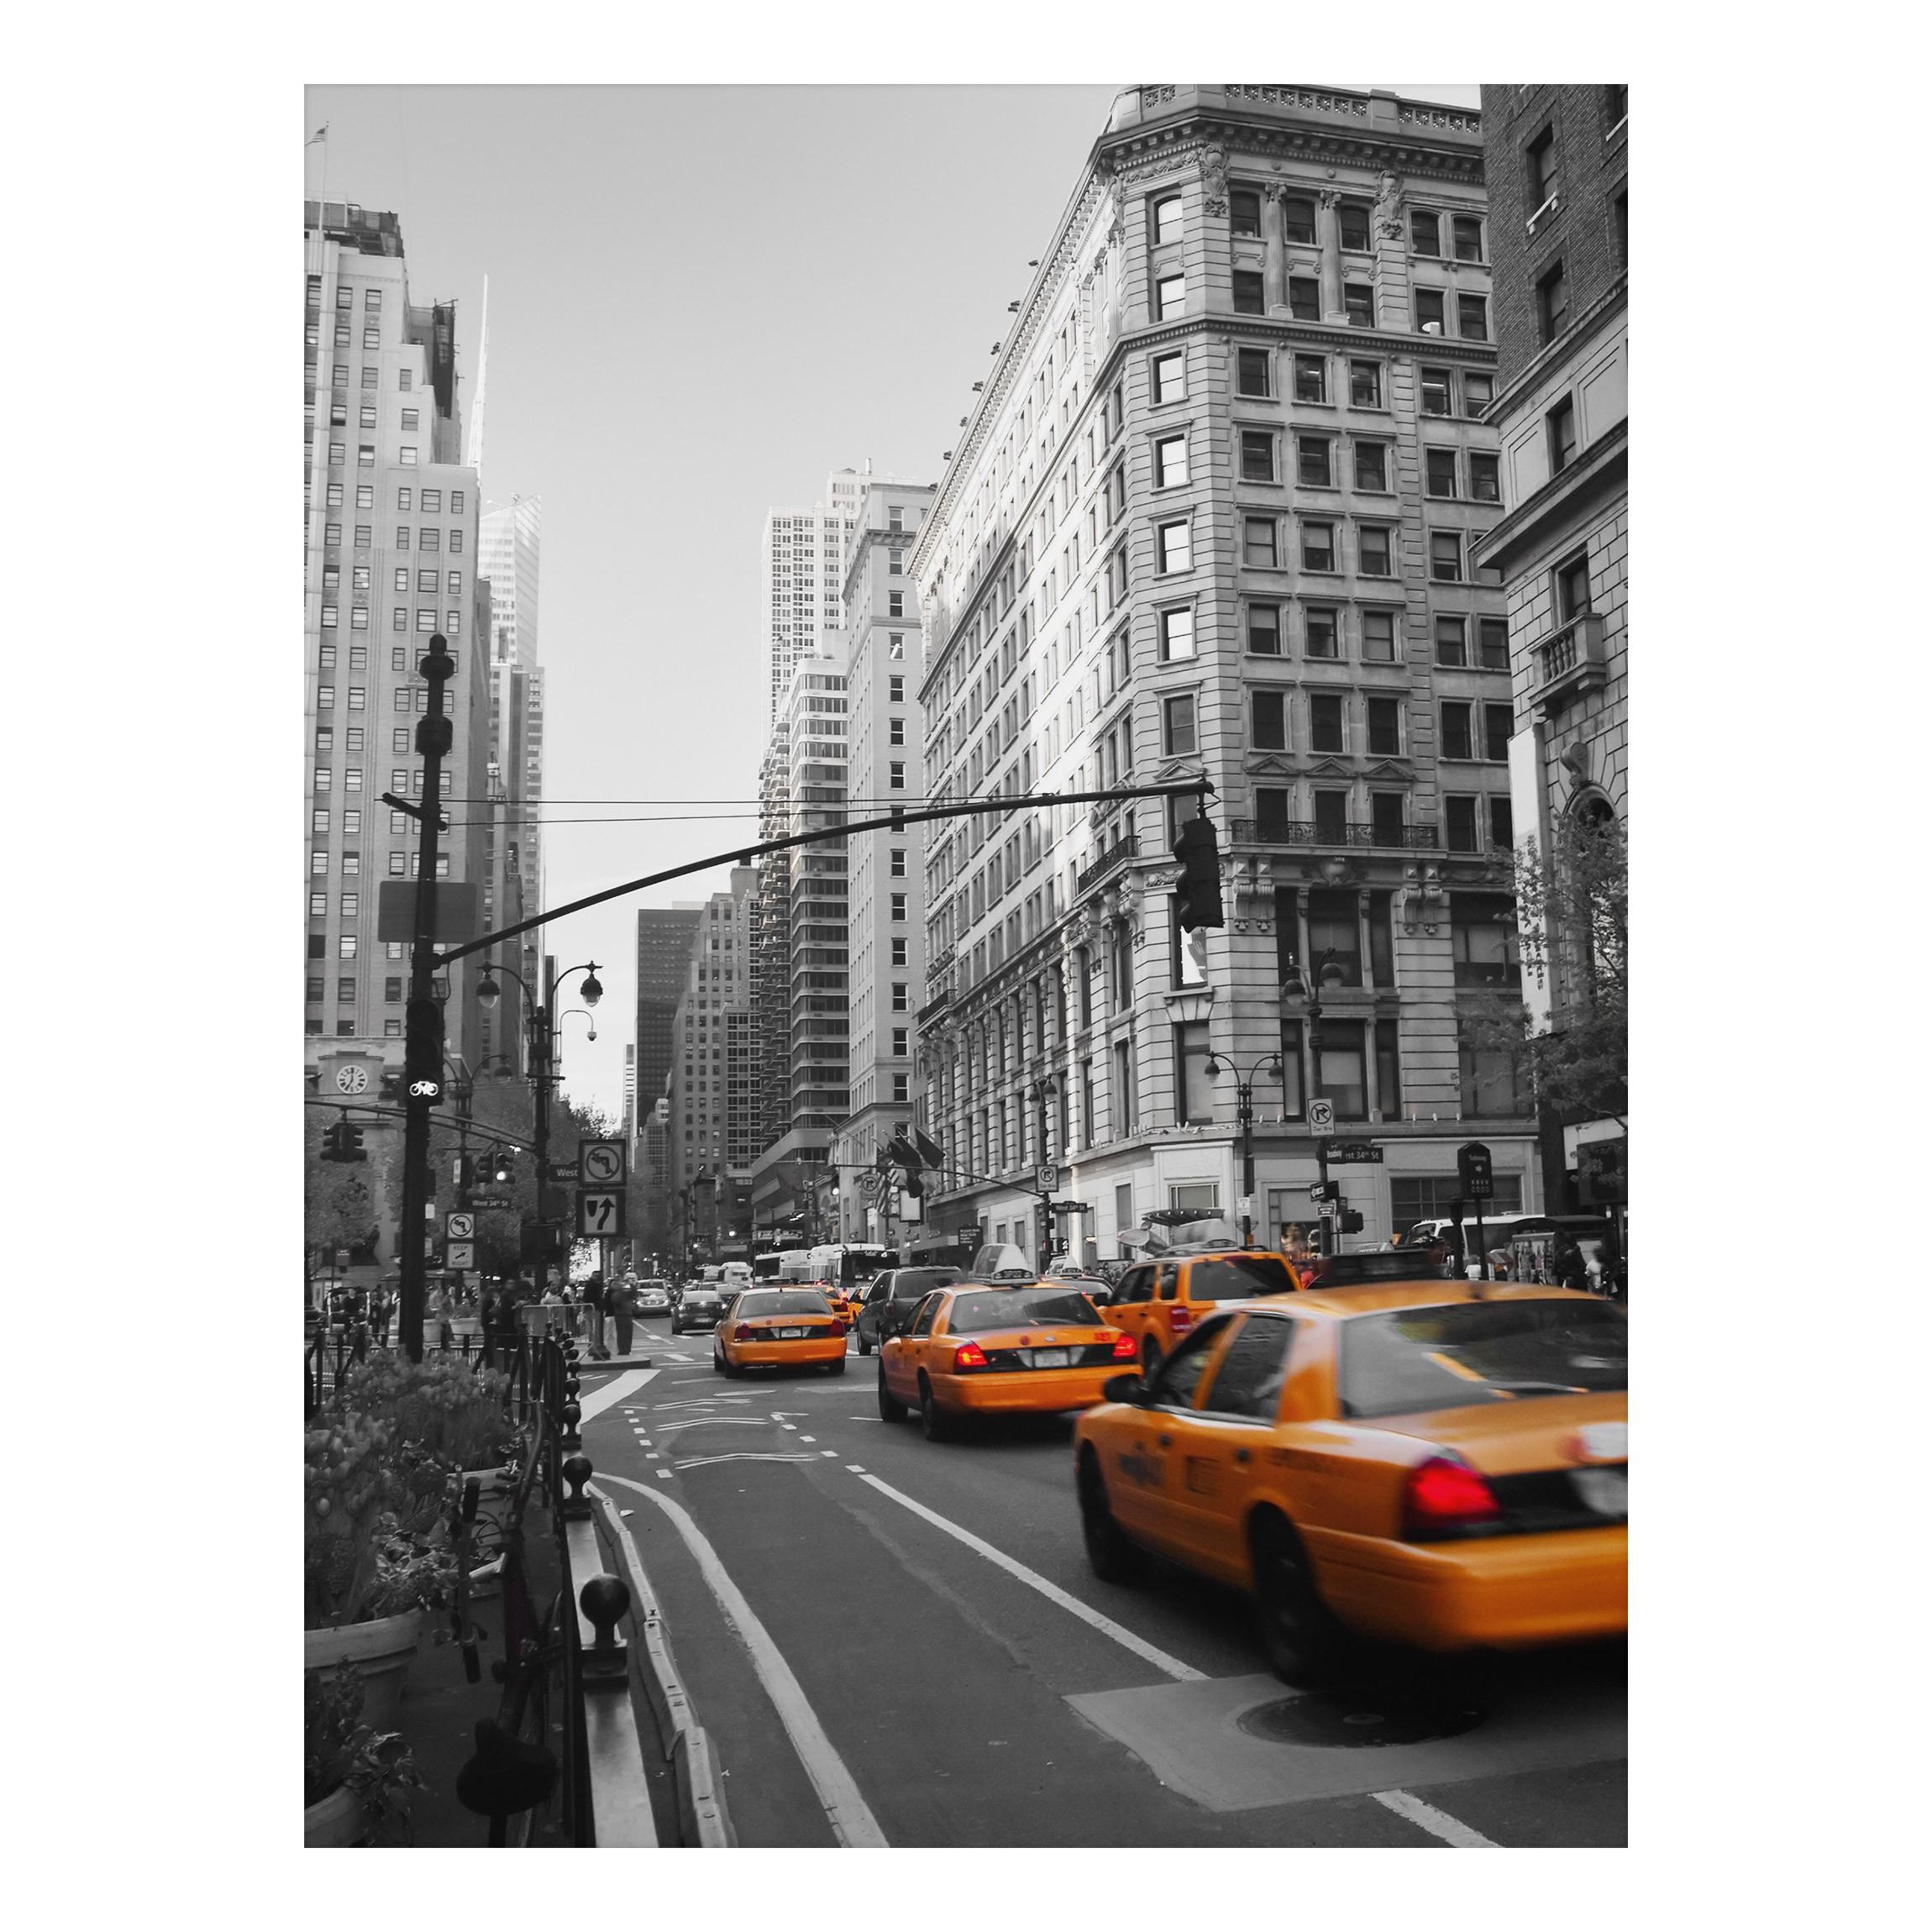 Aluminium print wandbild new york new york hoch 4 3 - Wandbild new york ...